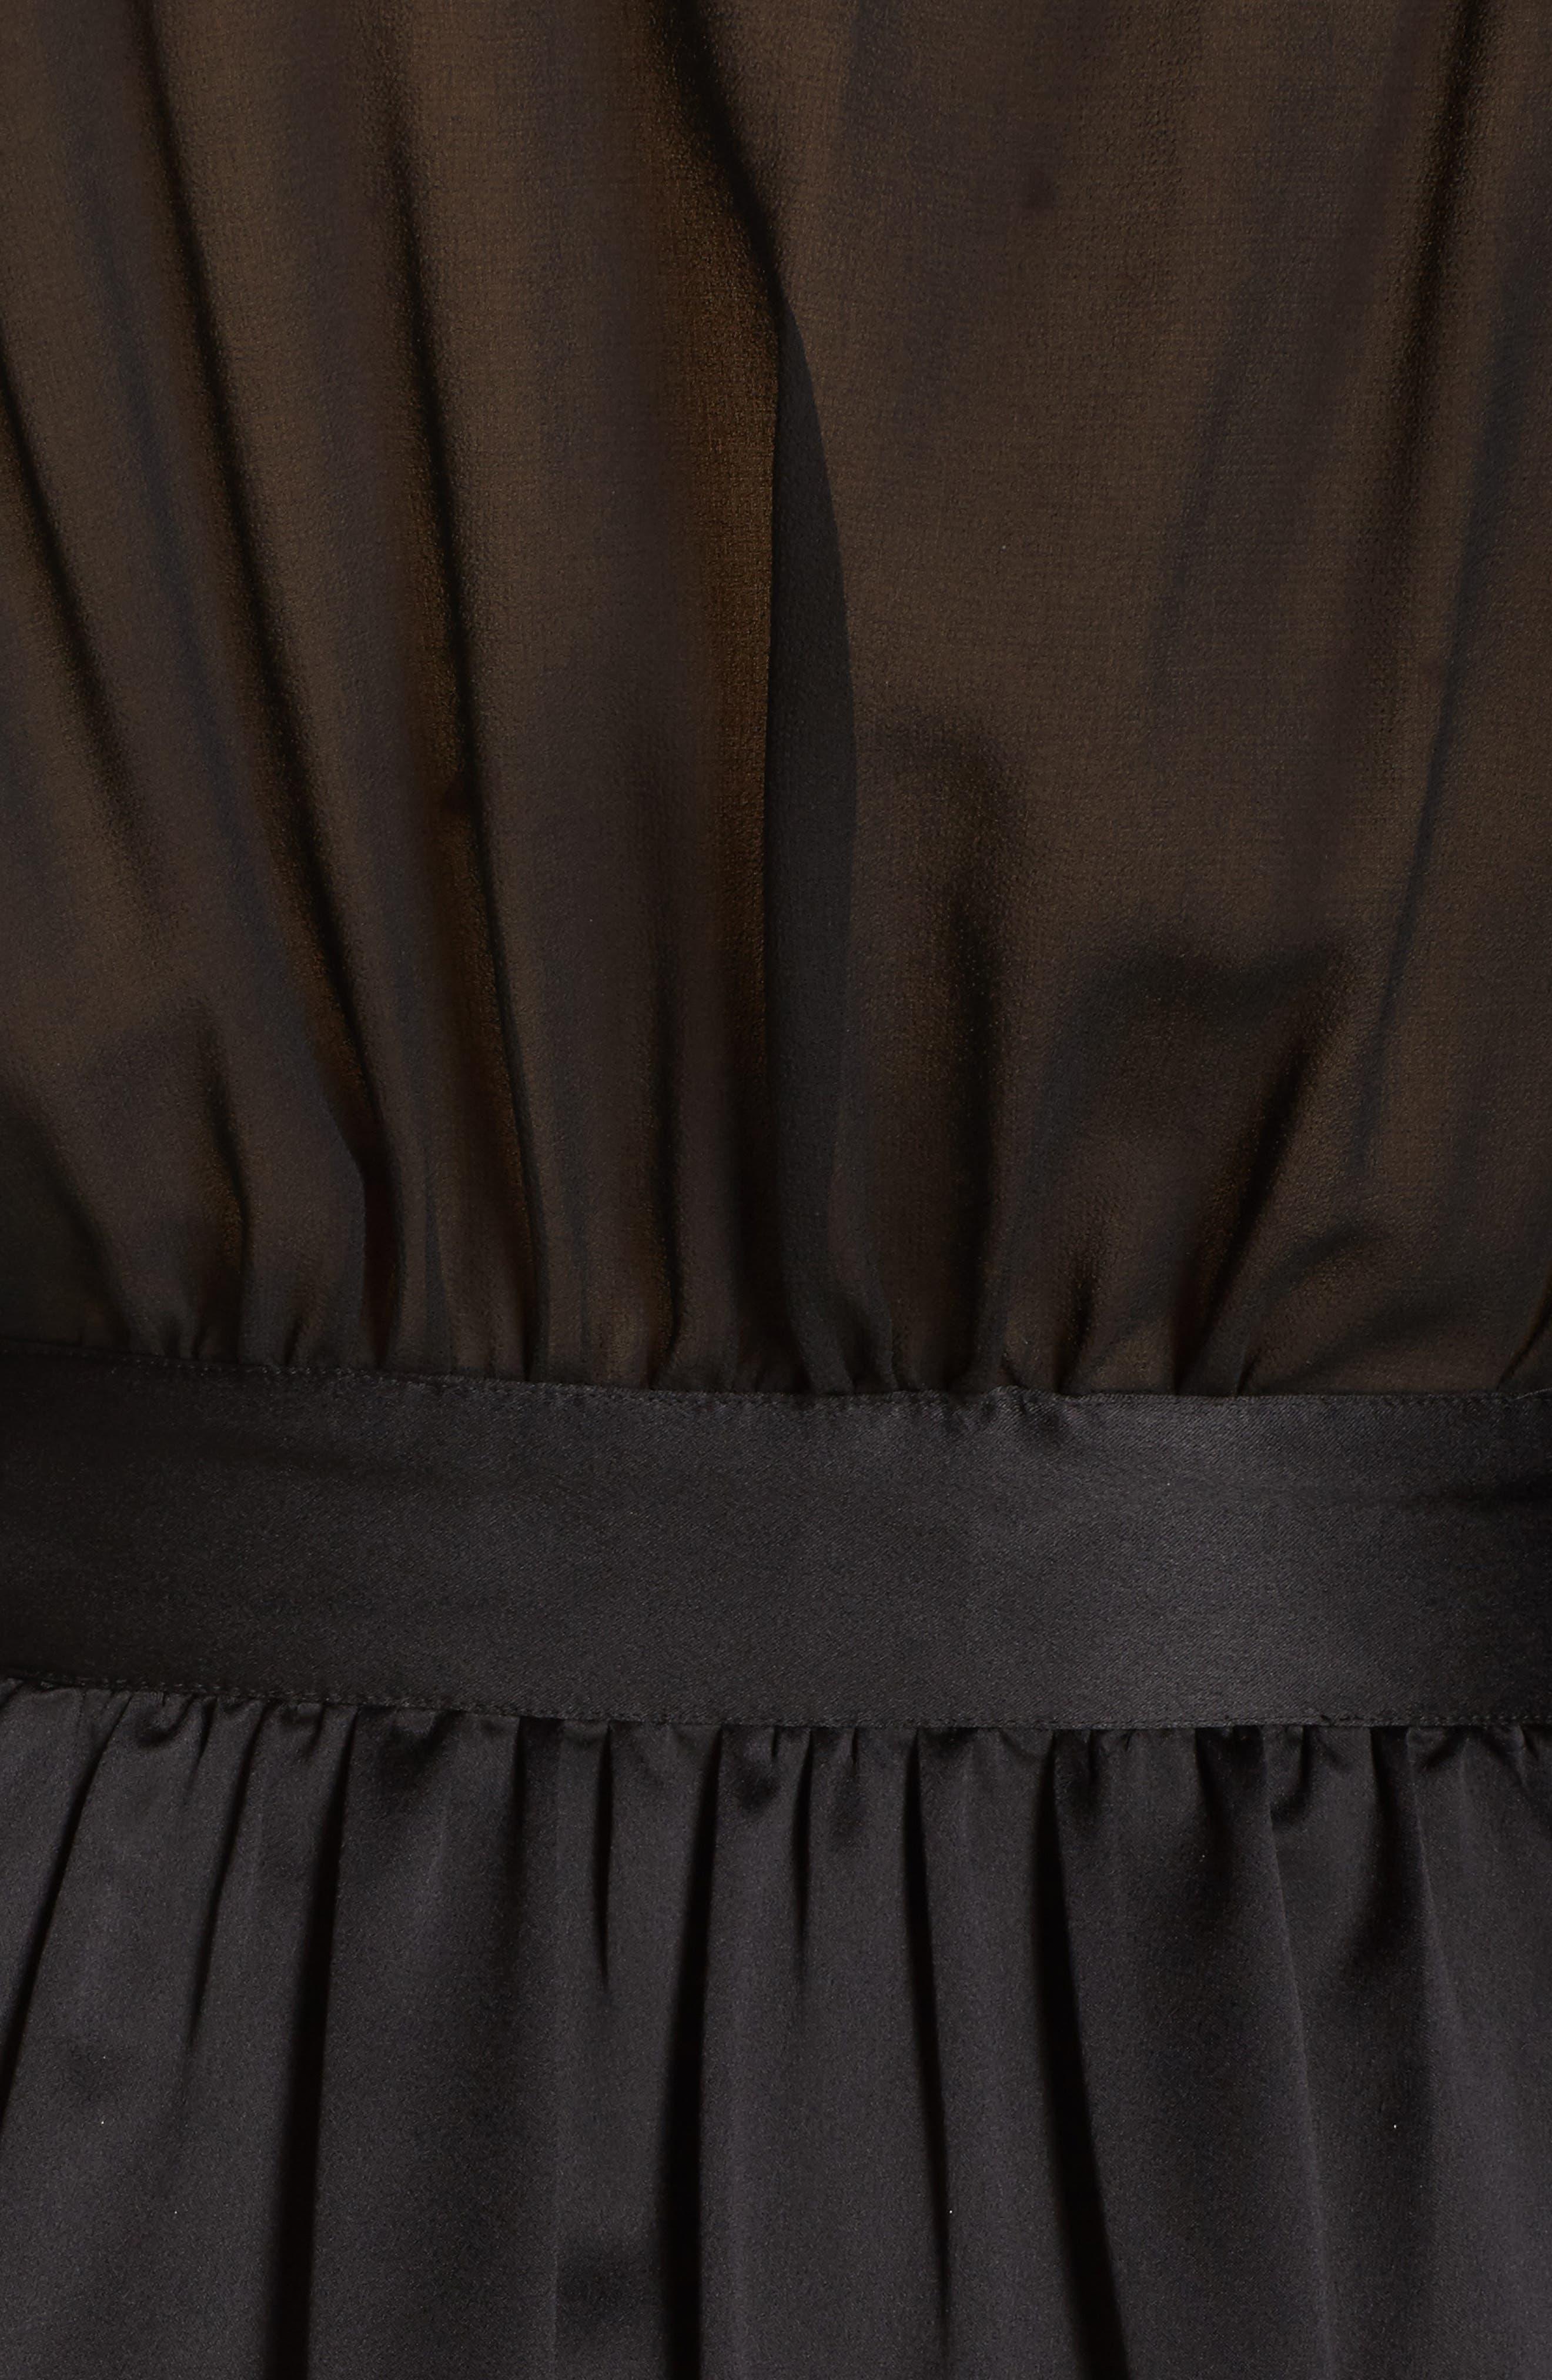 Margot Kimono Robe,                             Alternate thumbnail 6, color,                             Black